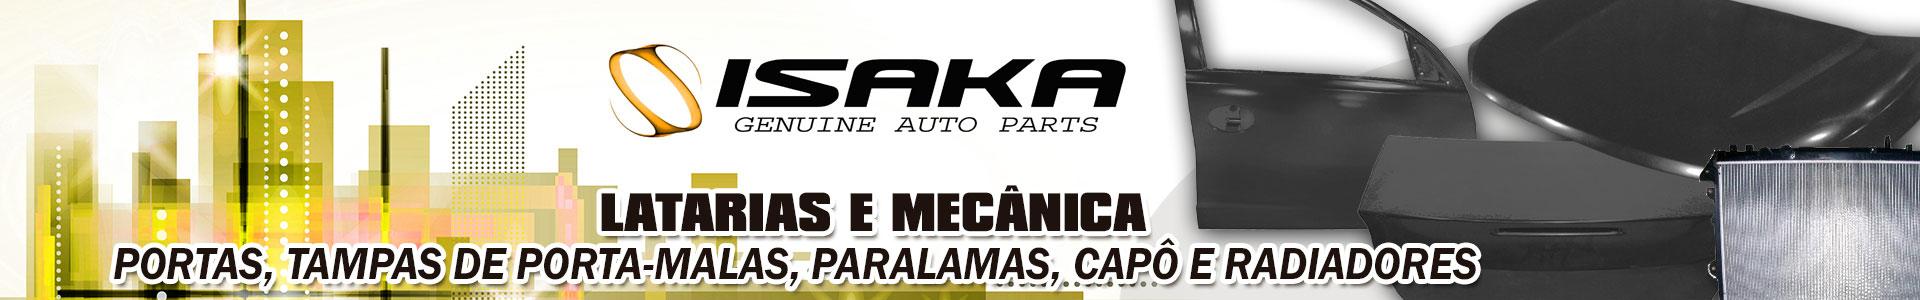 lateria-mecanica-isaca-ips-brasil